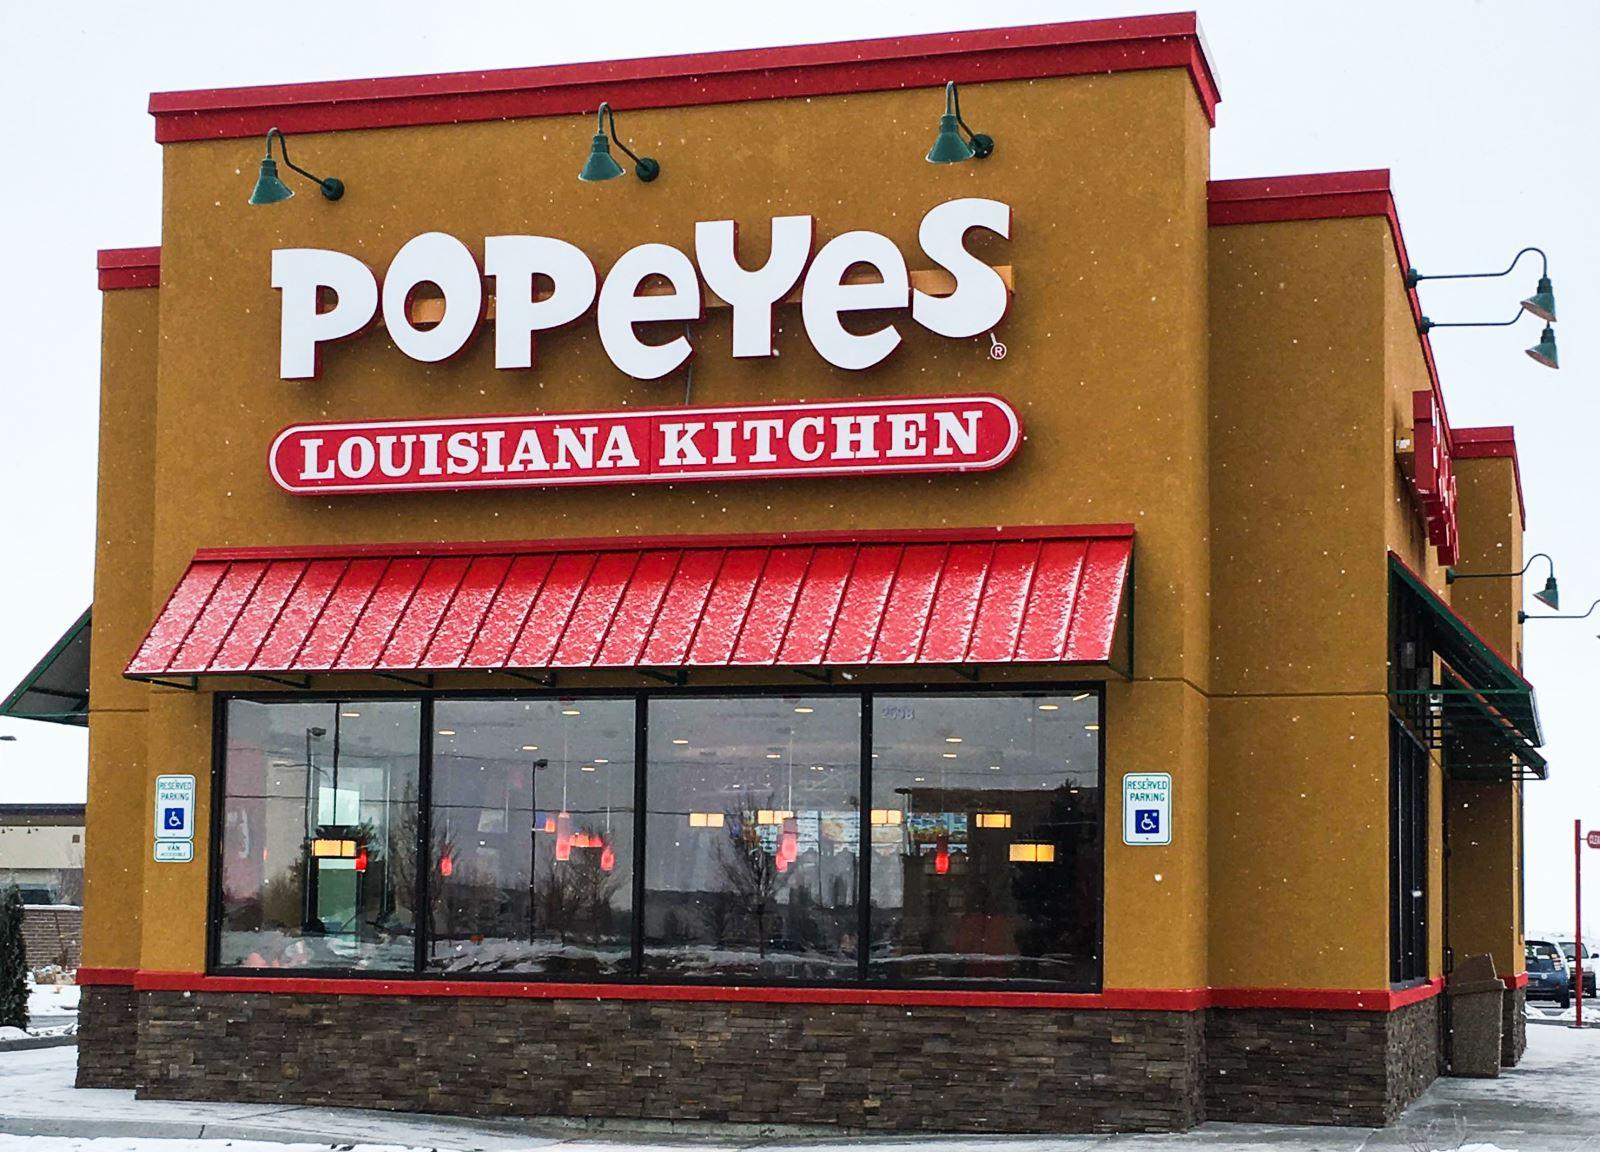 Popeyes Louisiana Kitchen Menu A Louisiana Kitchen At The Commons Popeyes Brings New Orleans